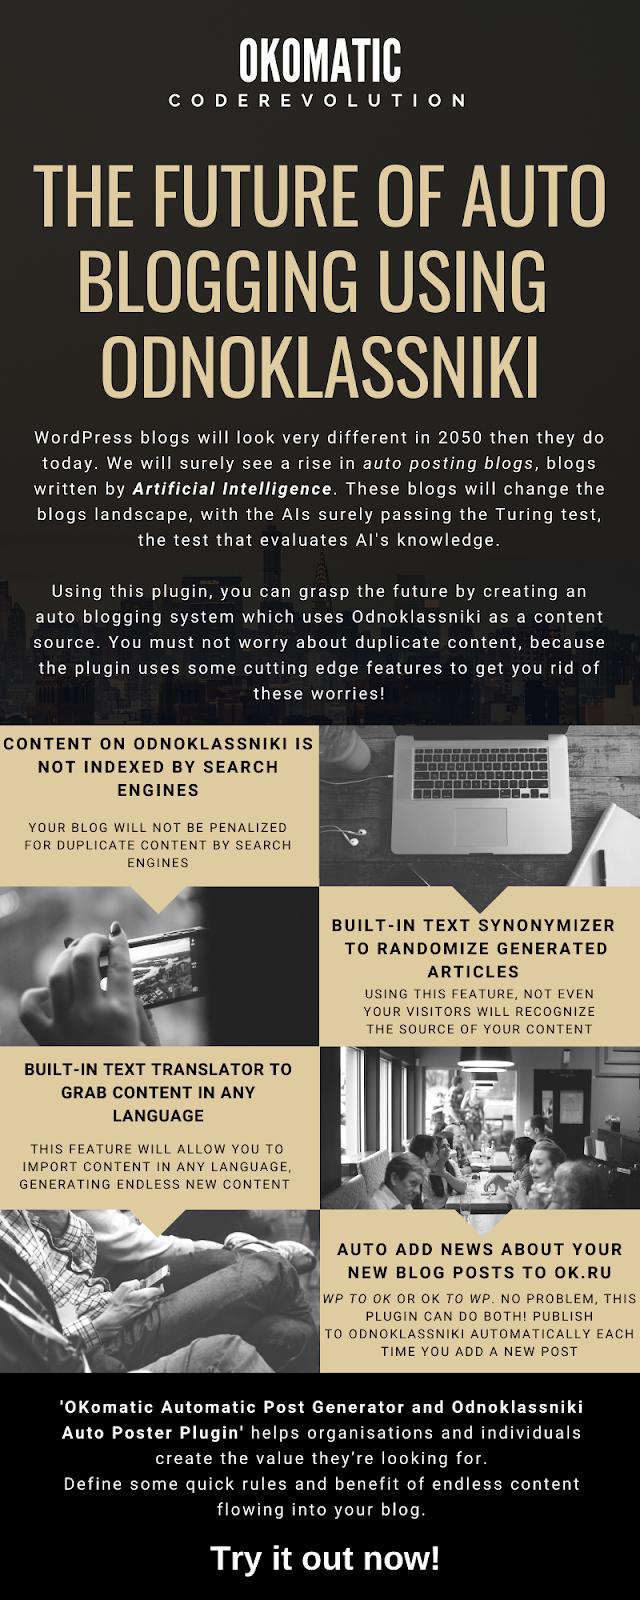 OKomatic Automatic Post Generator and Odnoklassniki Auto Poster Plugin for WordPress